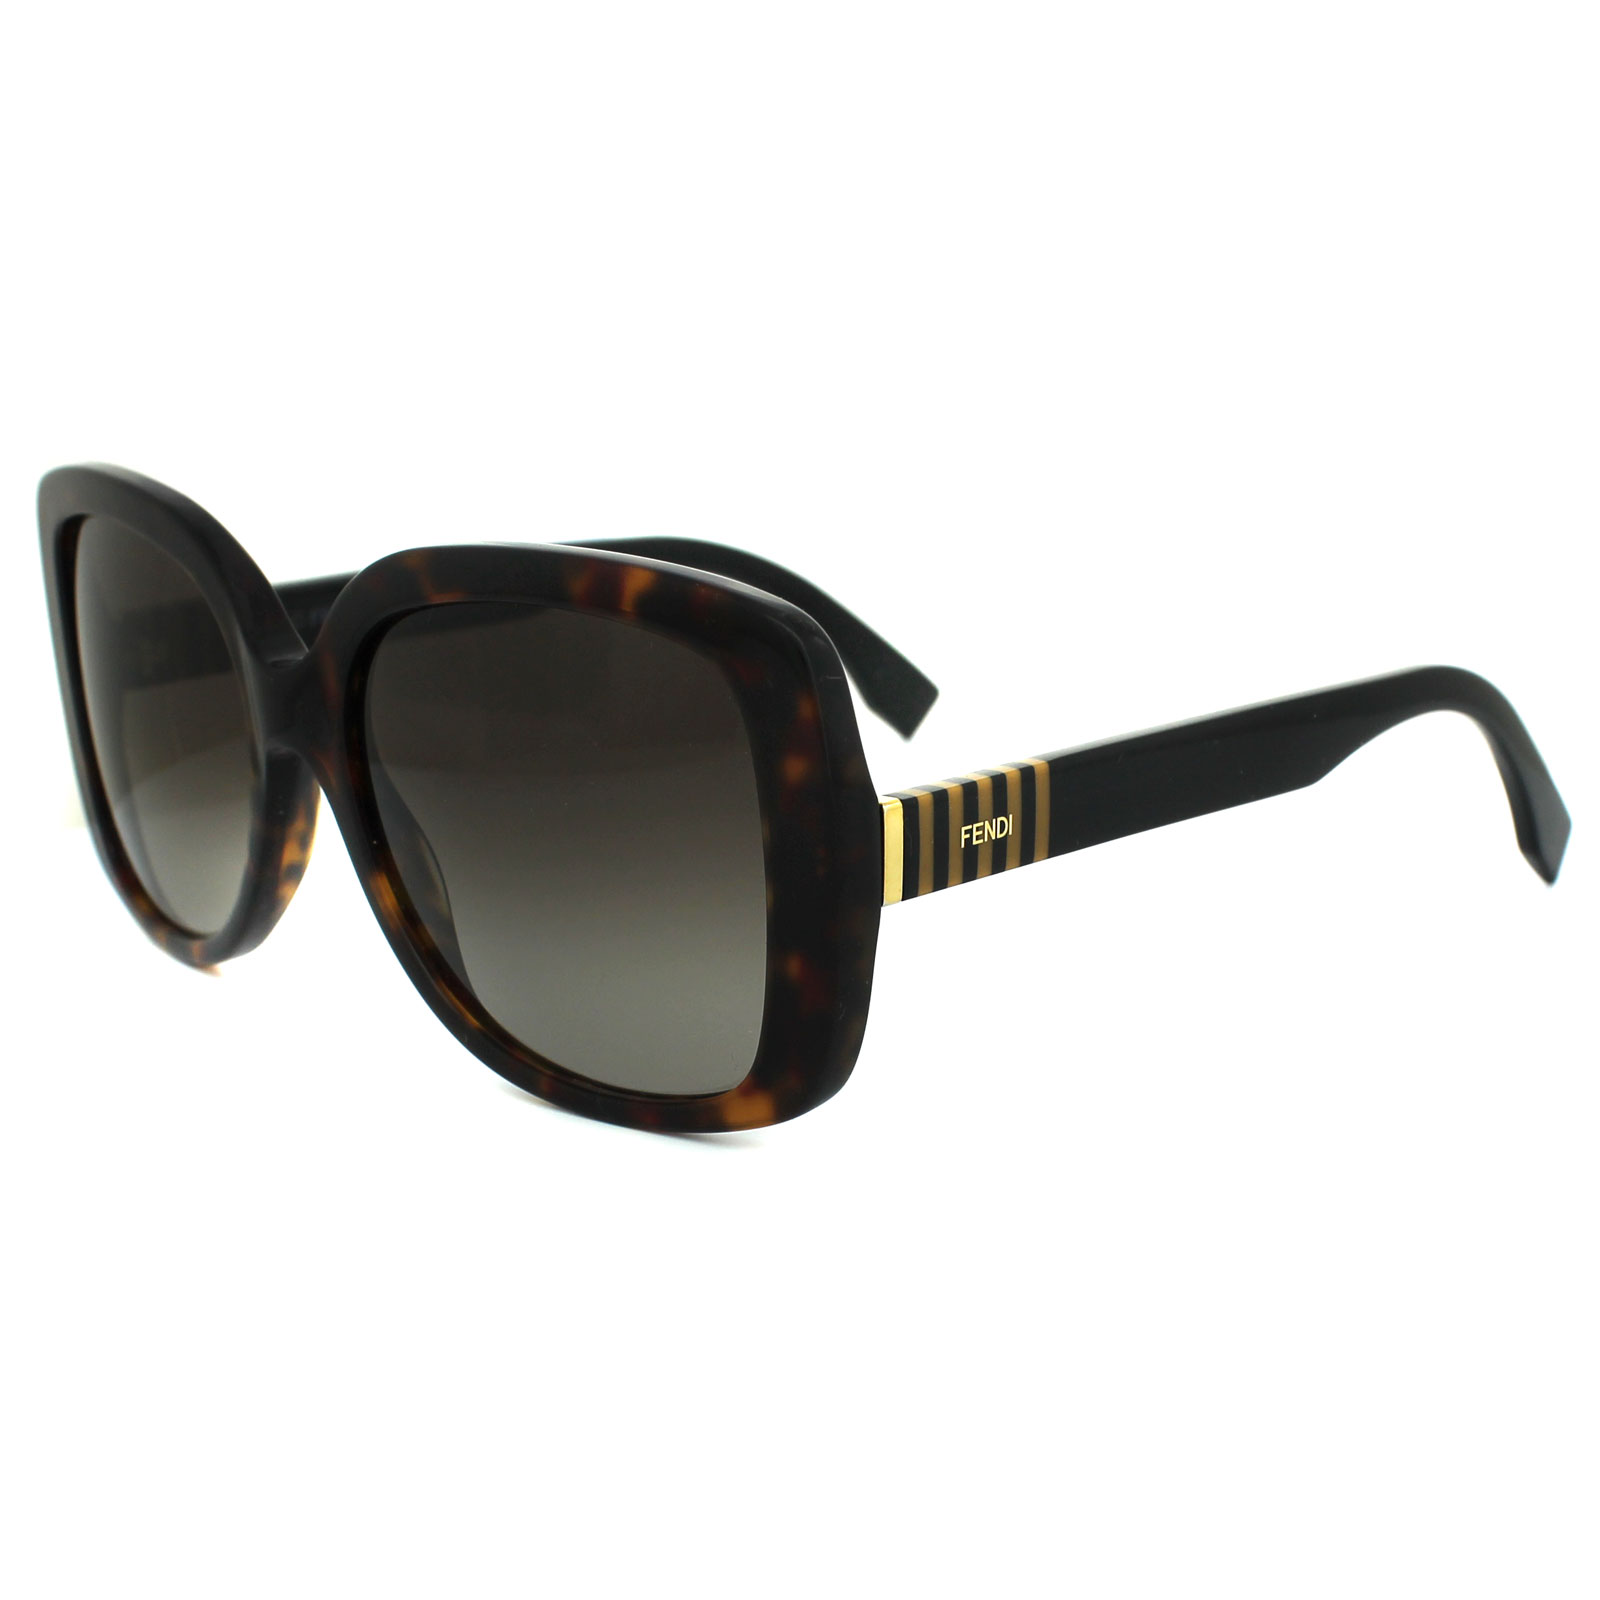 2d54a0c4840 Sentinel Fendi Sunglasses Pequin FF 0014 S 7TO HA Havana   Black Brown  Gradient